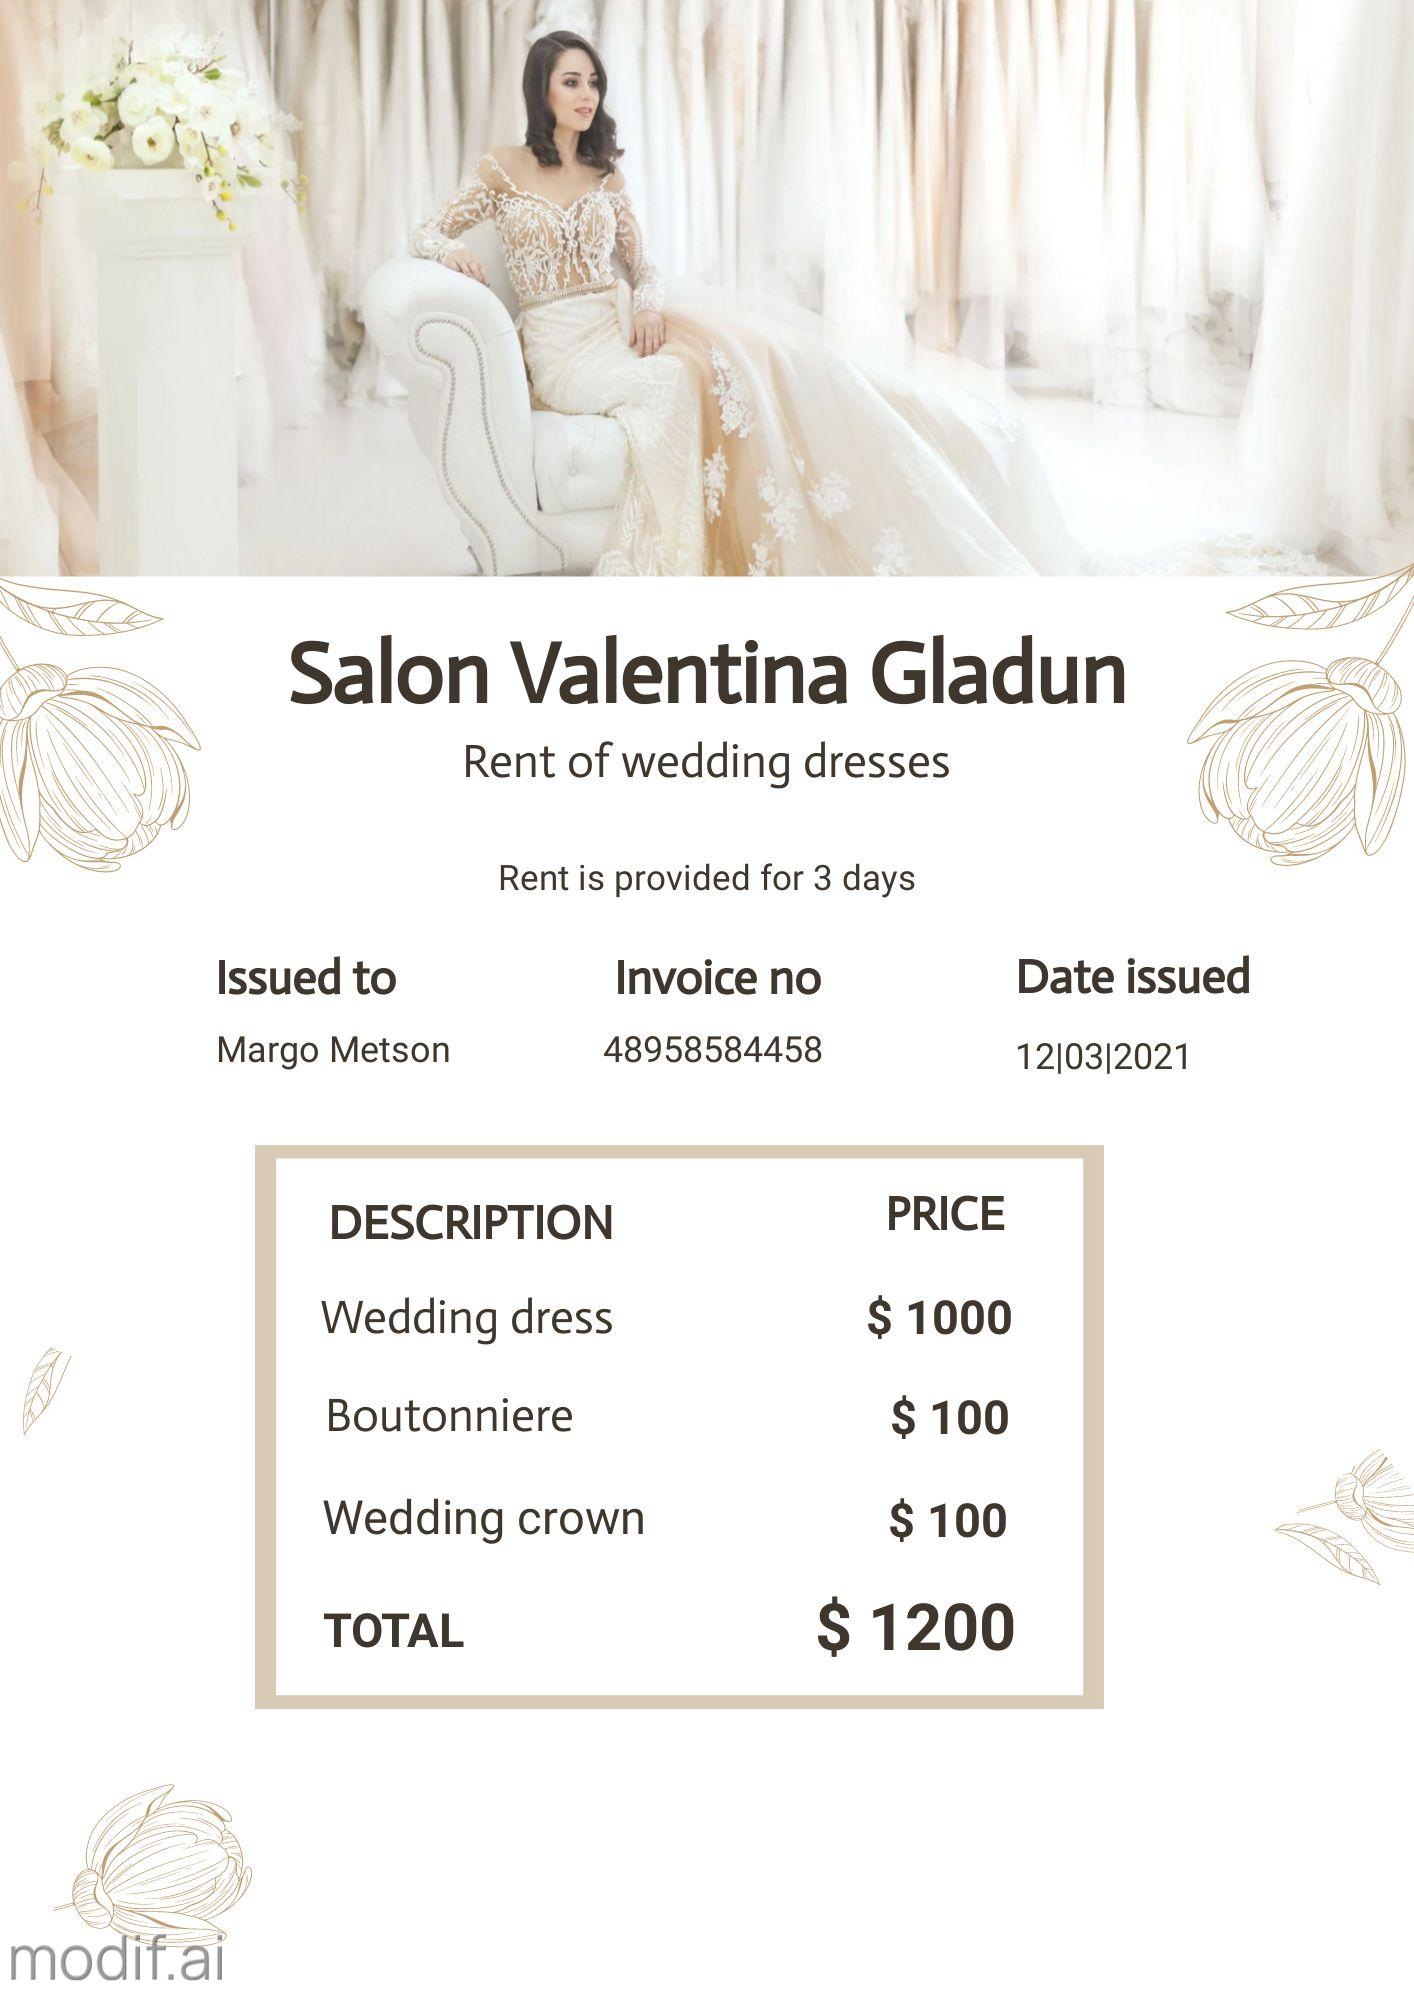 Invoice Design for Wedding Salon